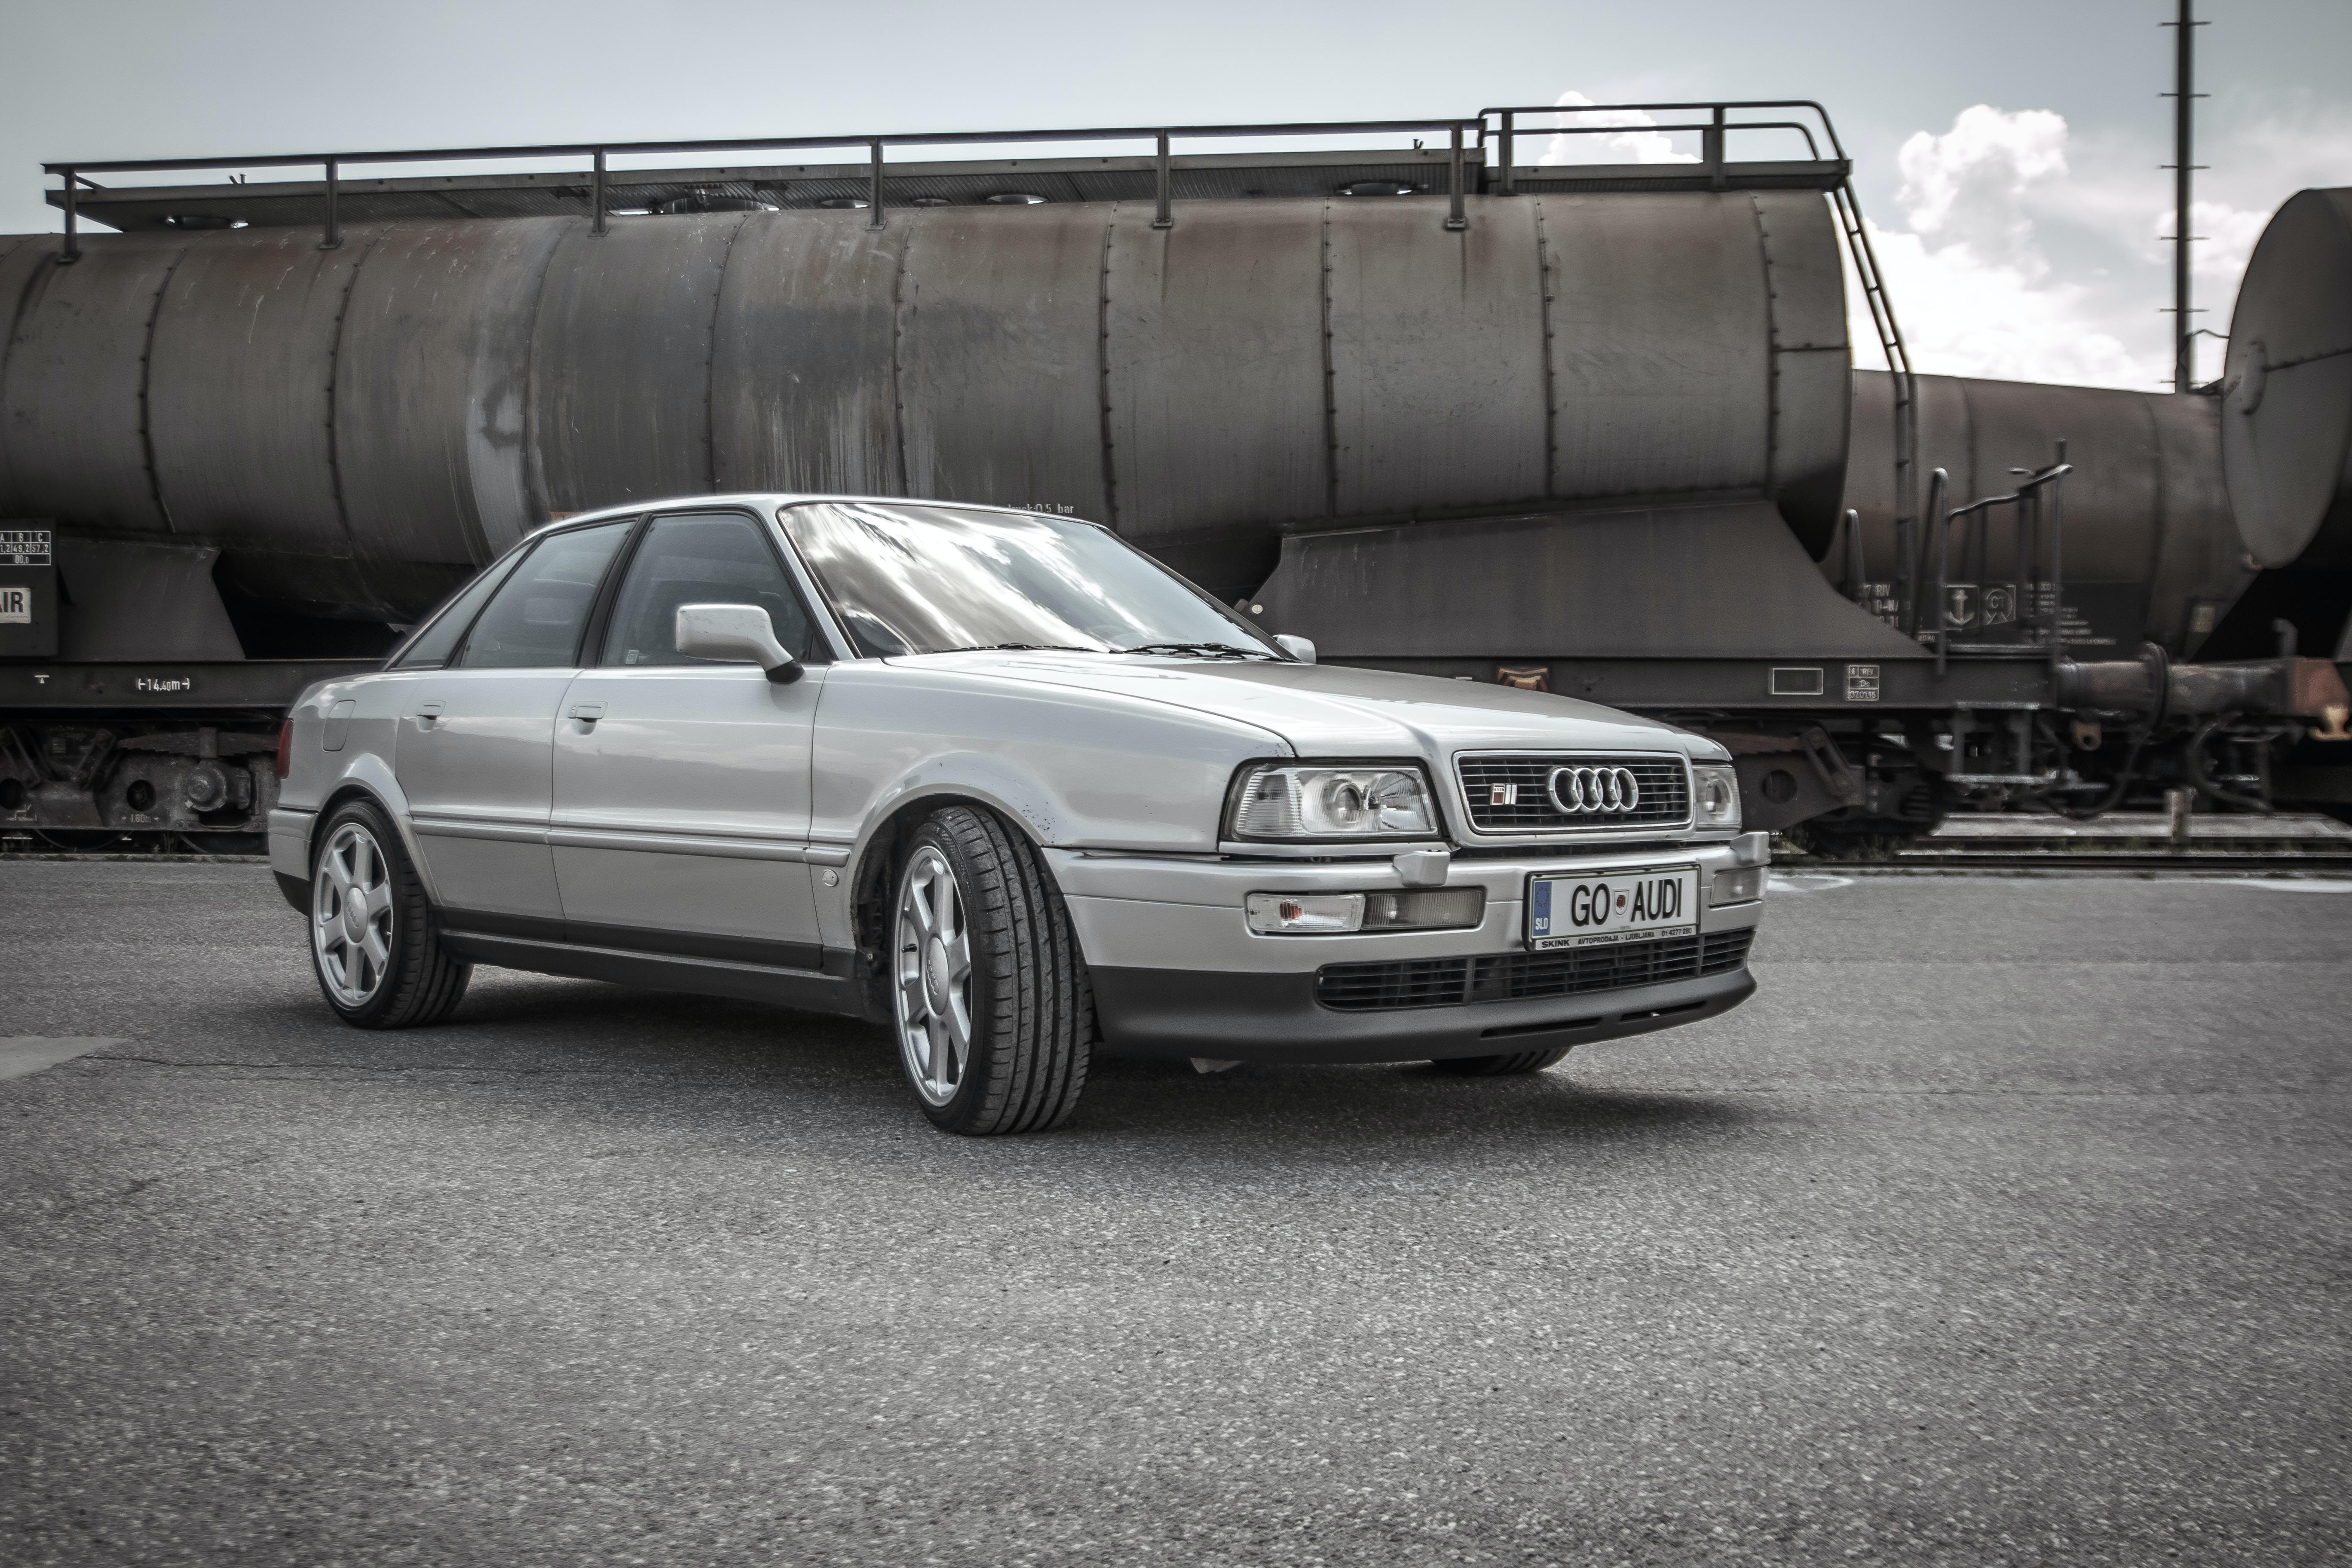 photo of silver Audi sedan on pavement